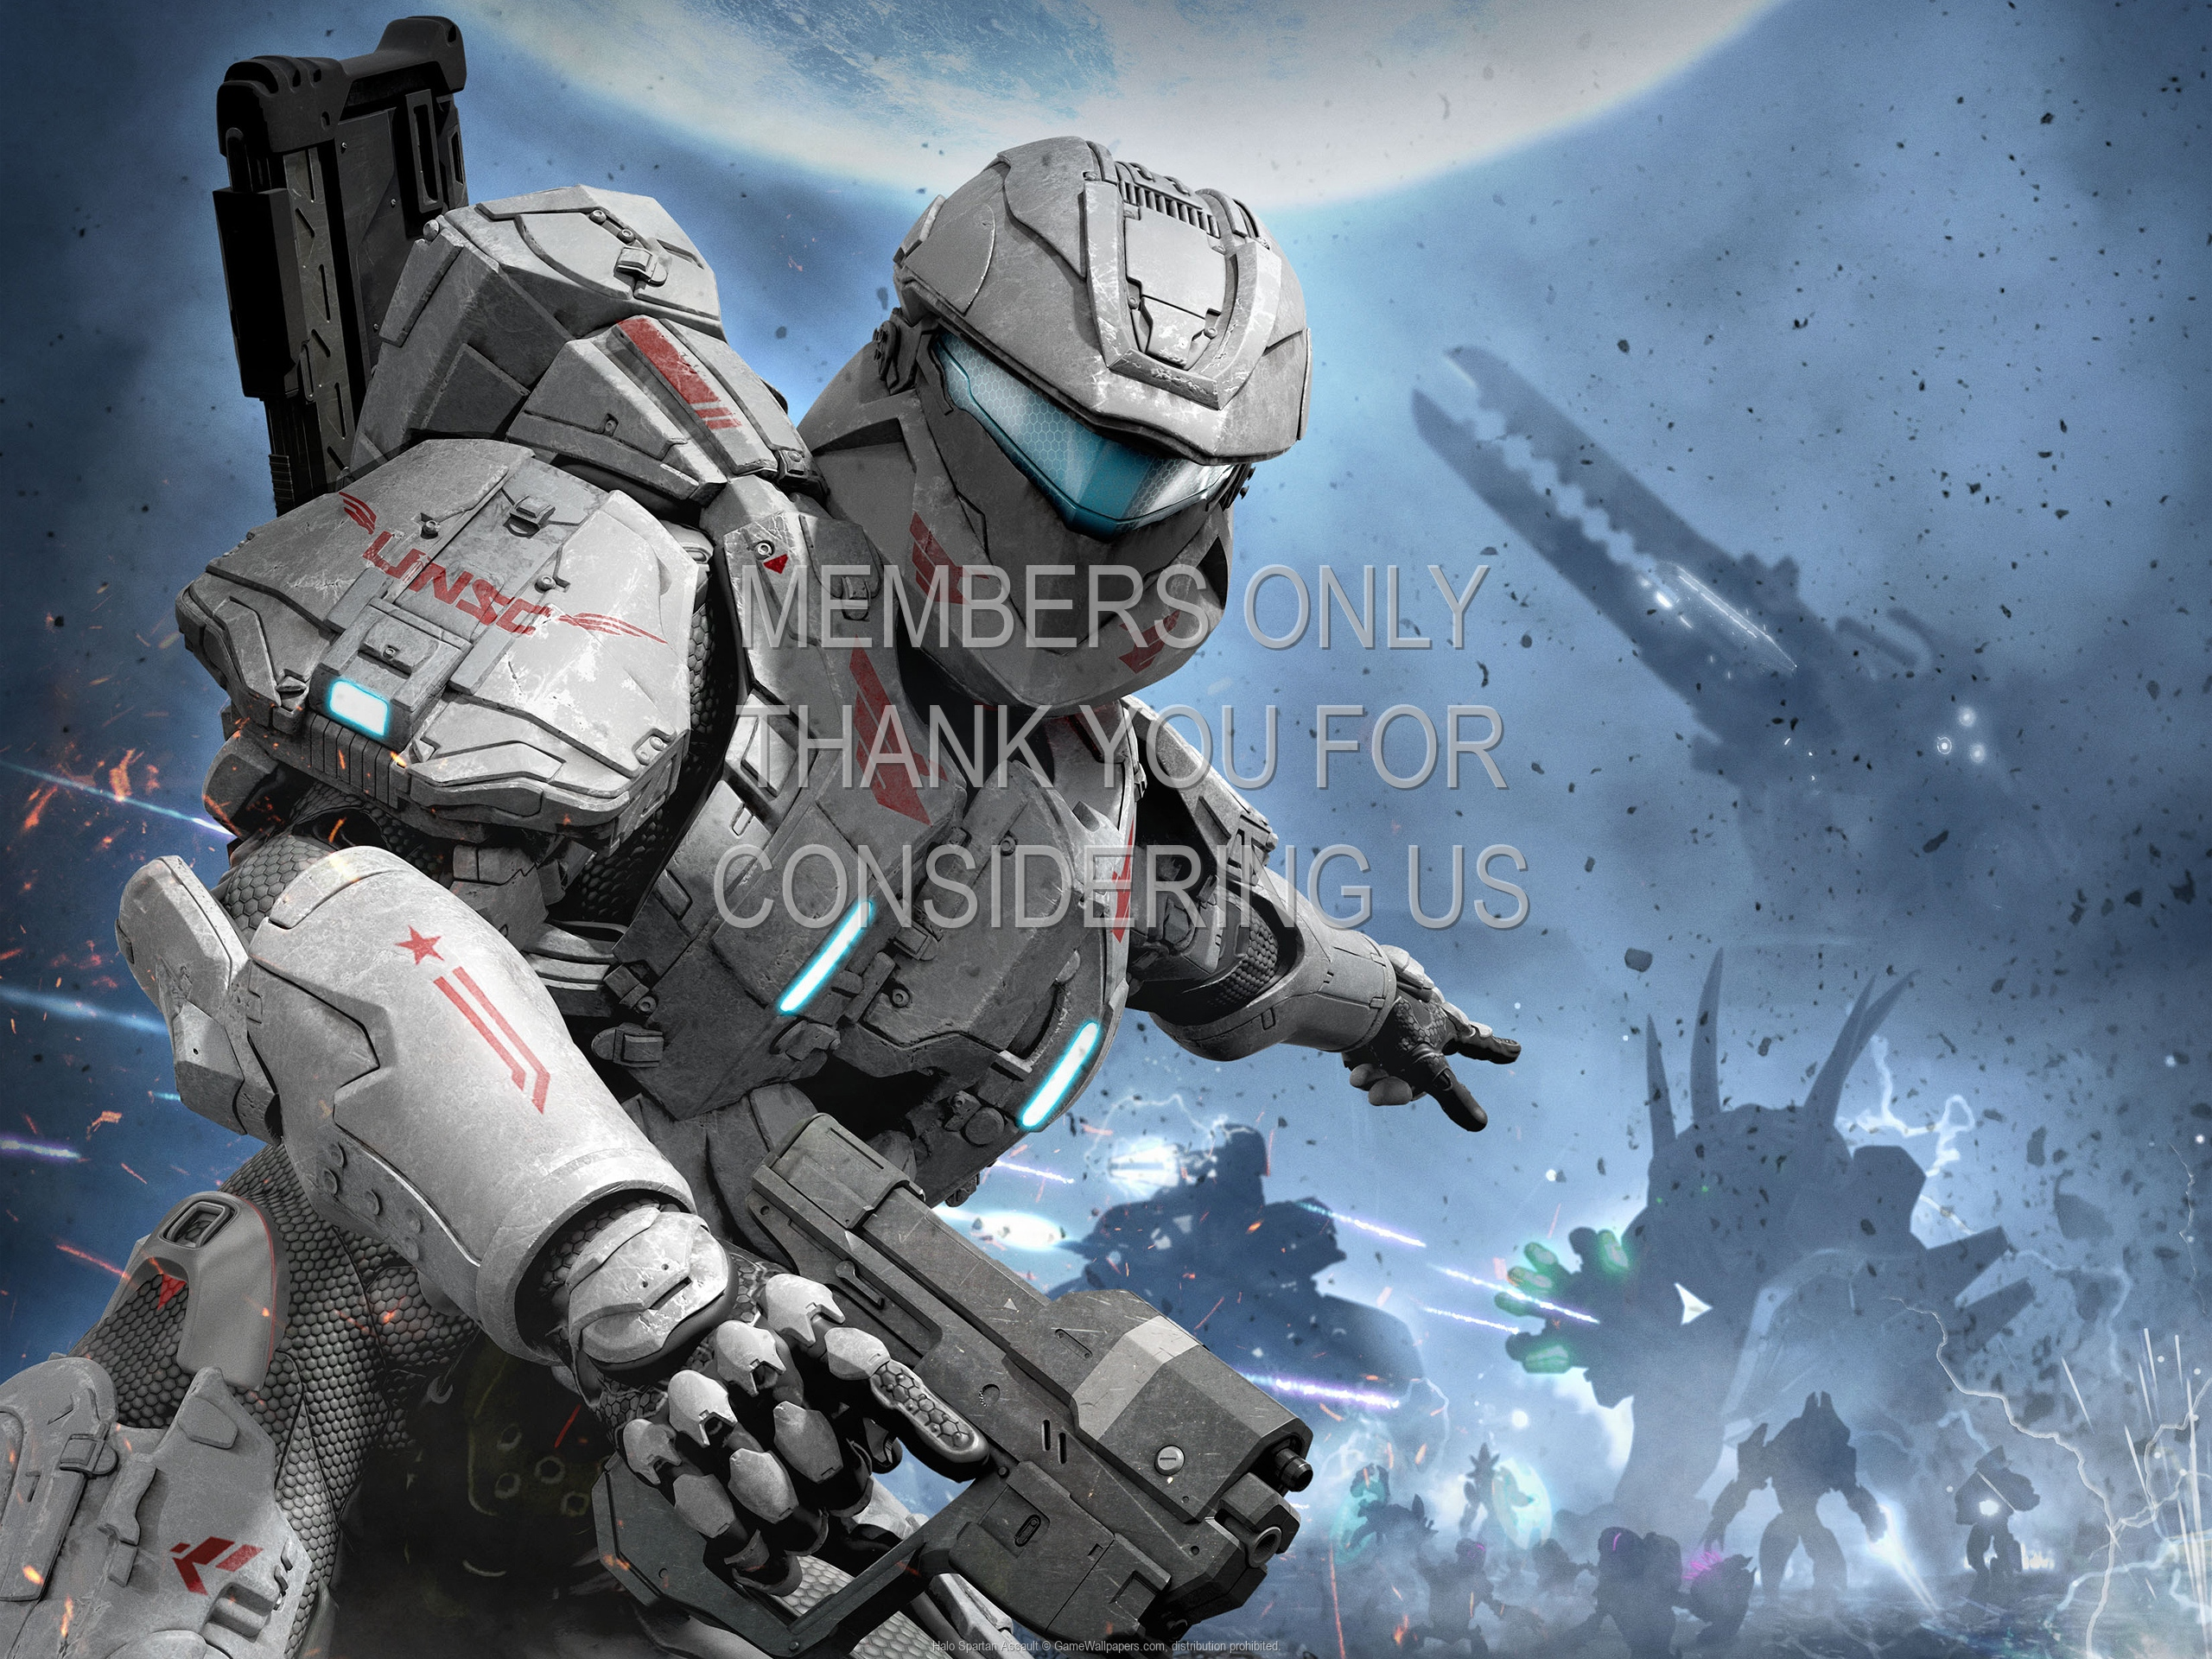 Halo: Spartan Assault 1920x1080 Handy Hintergrundbild 01